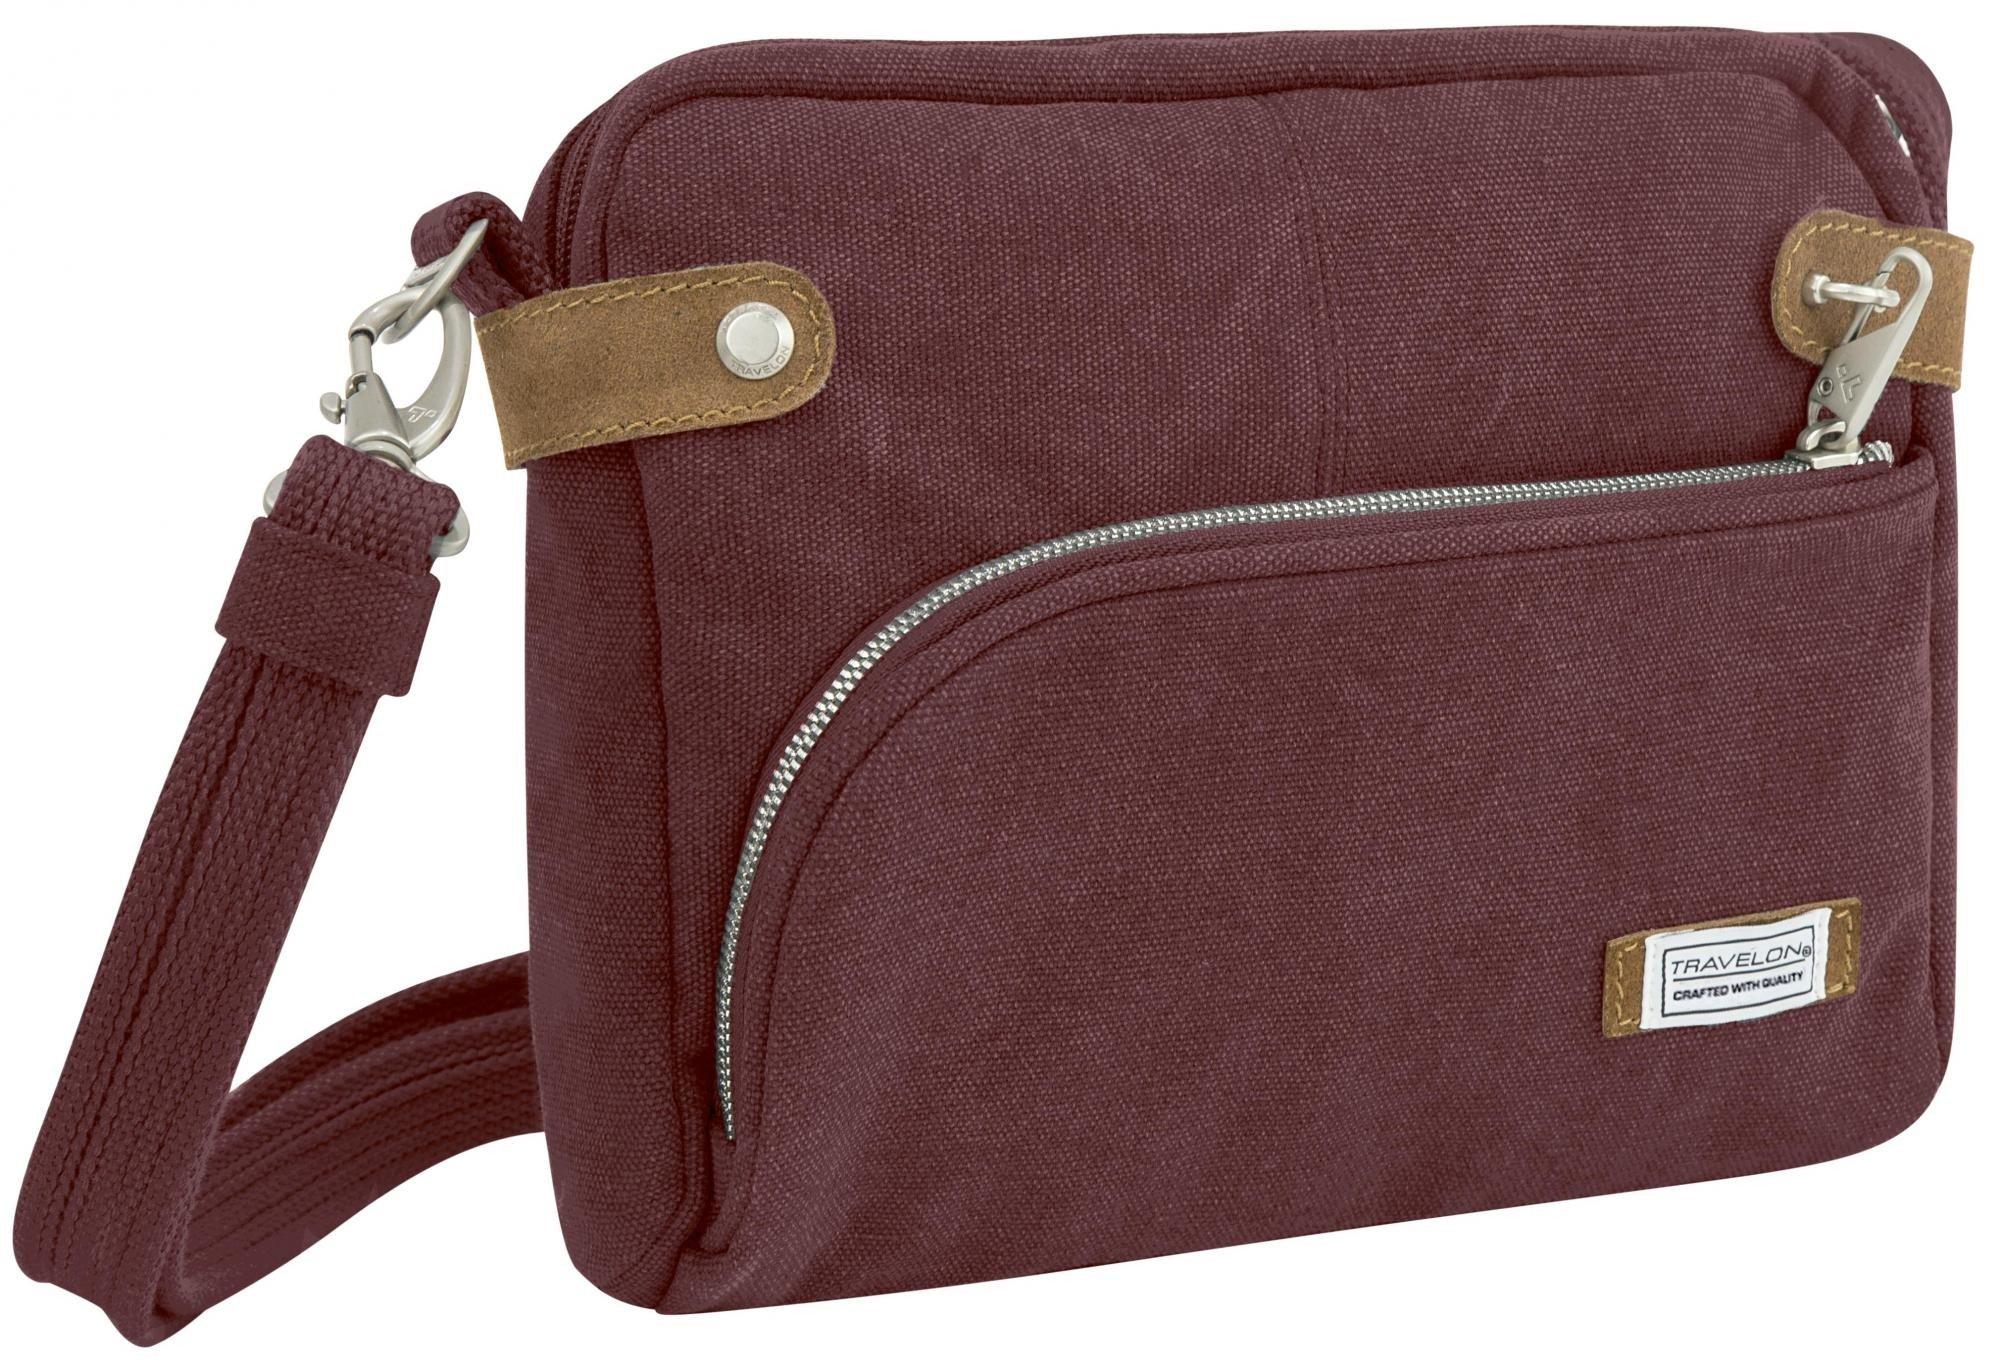 Travelon Anti-theft Heritage Crossbody Bag, Wine